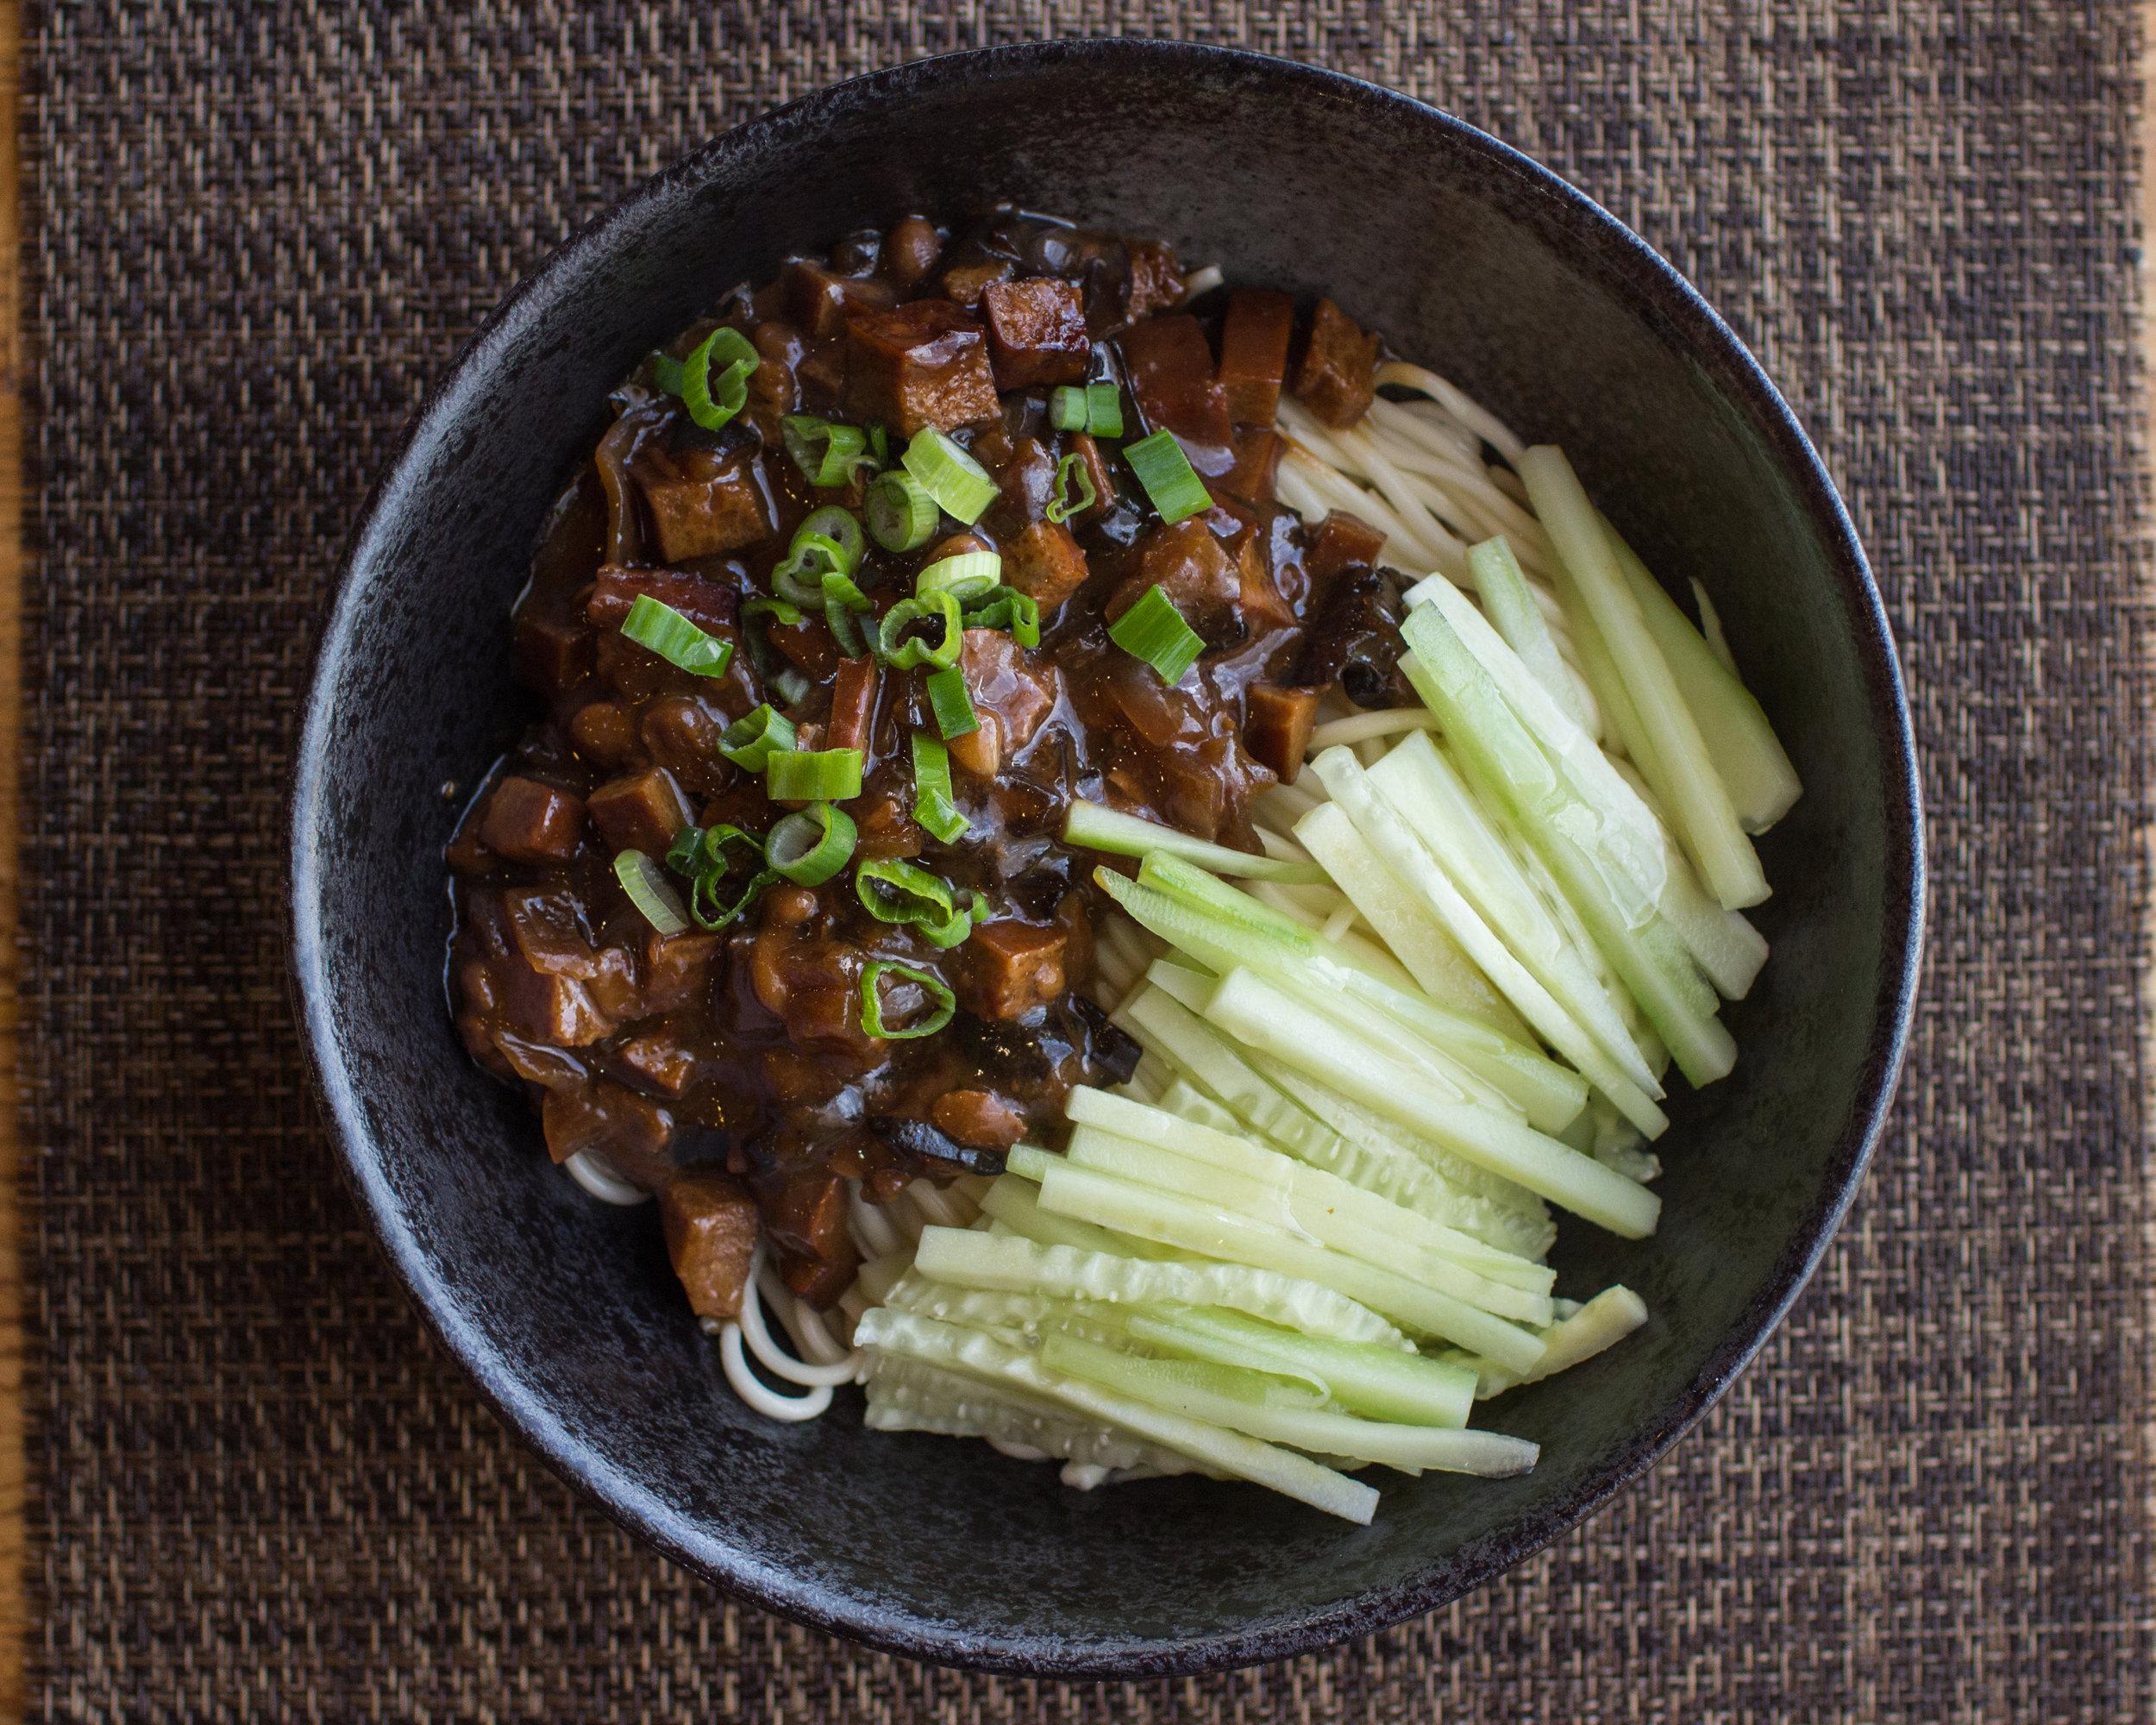 Gourmet Noodle House_Beijing Bean Sauce Noodles_2880x2304.jpg